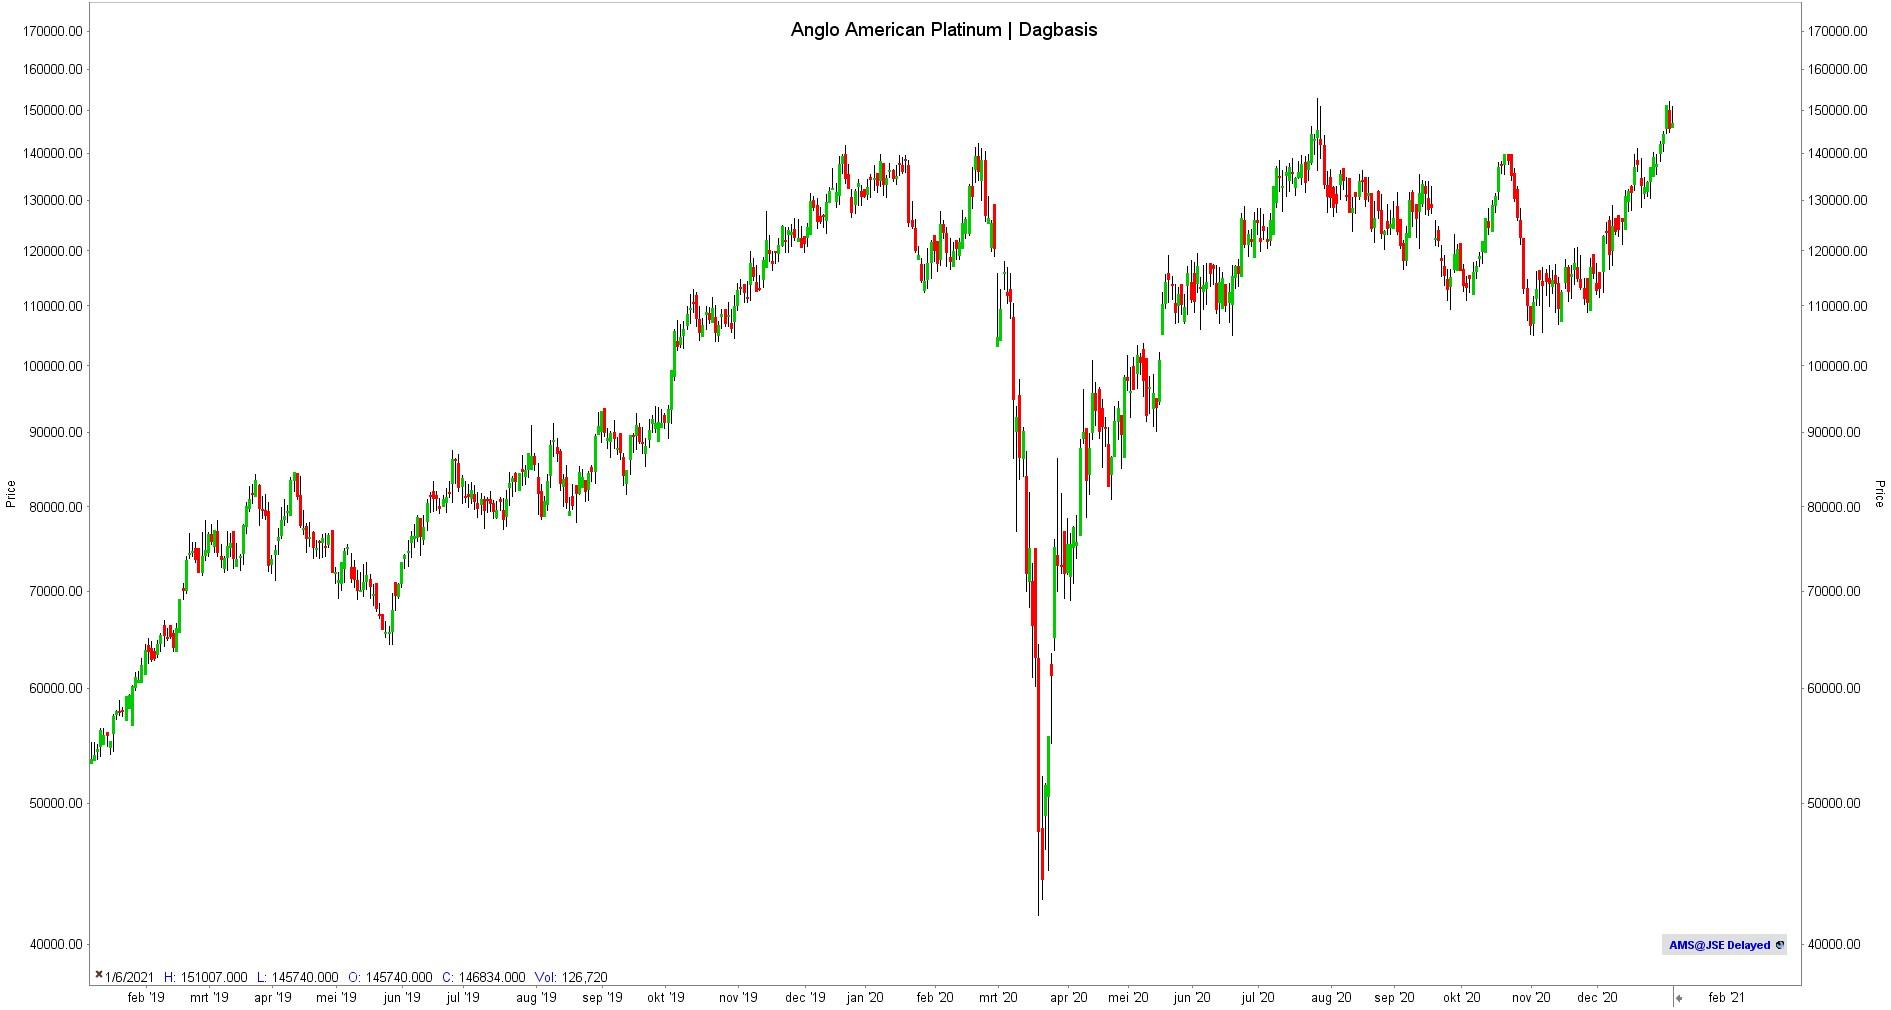 Anglo American Platinum - Dagbasis